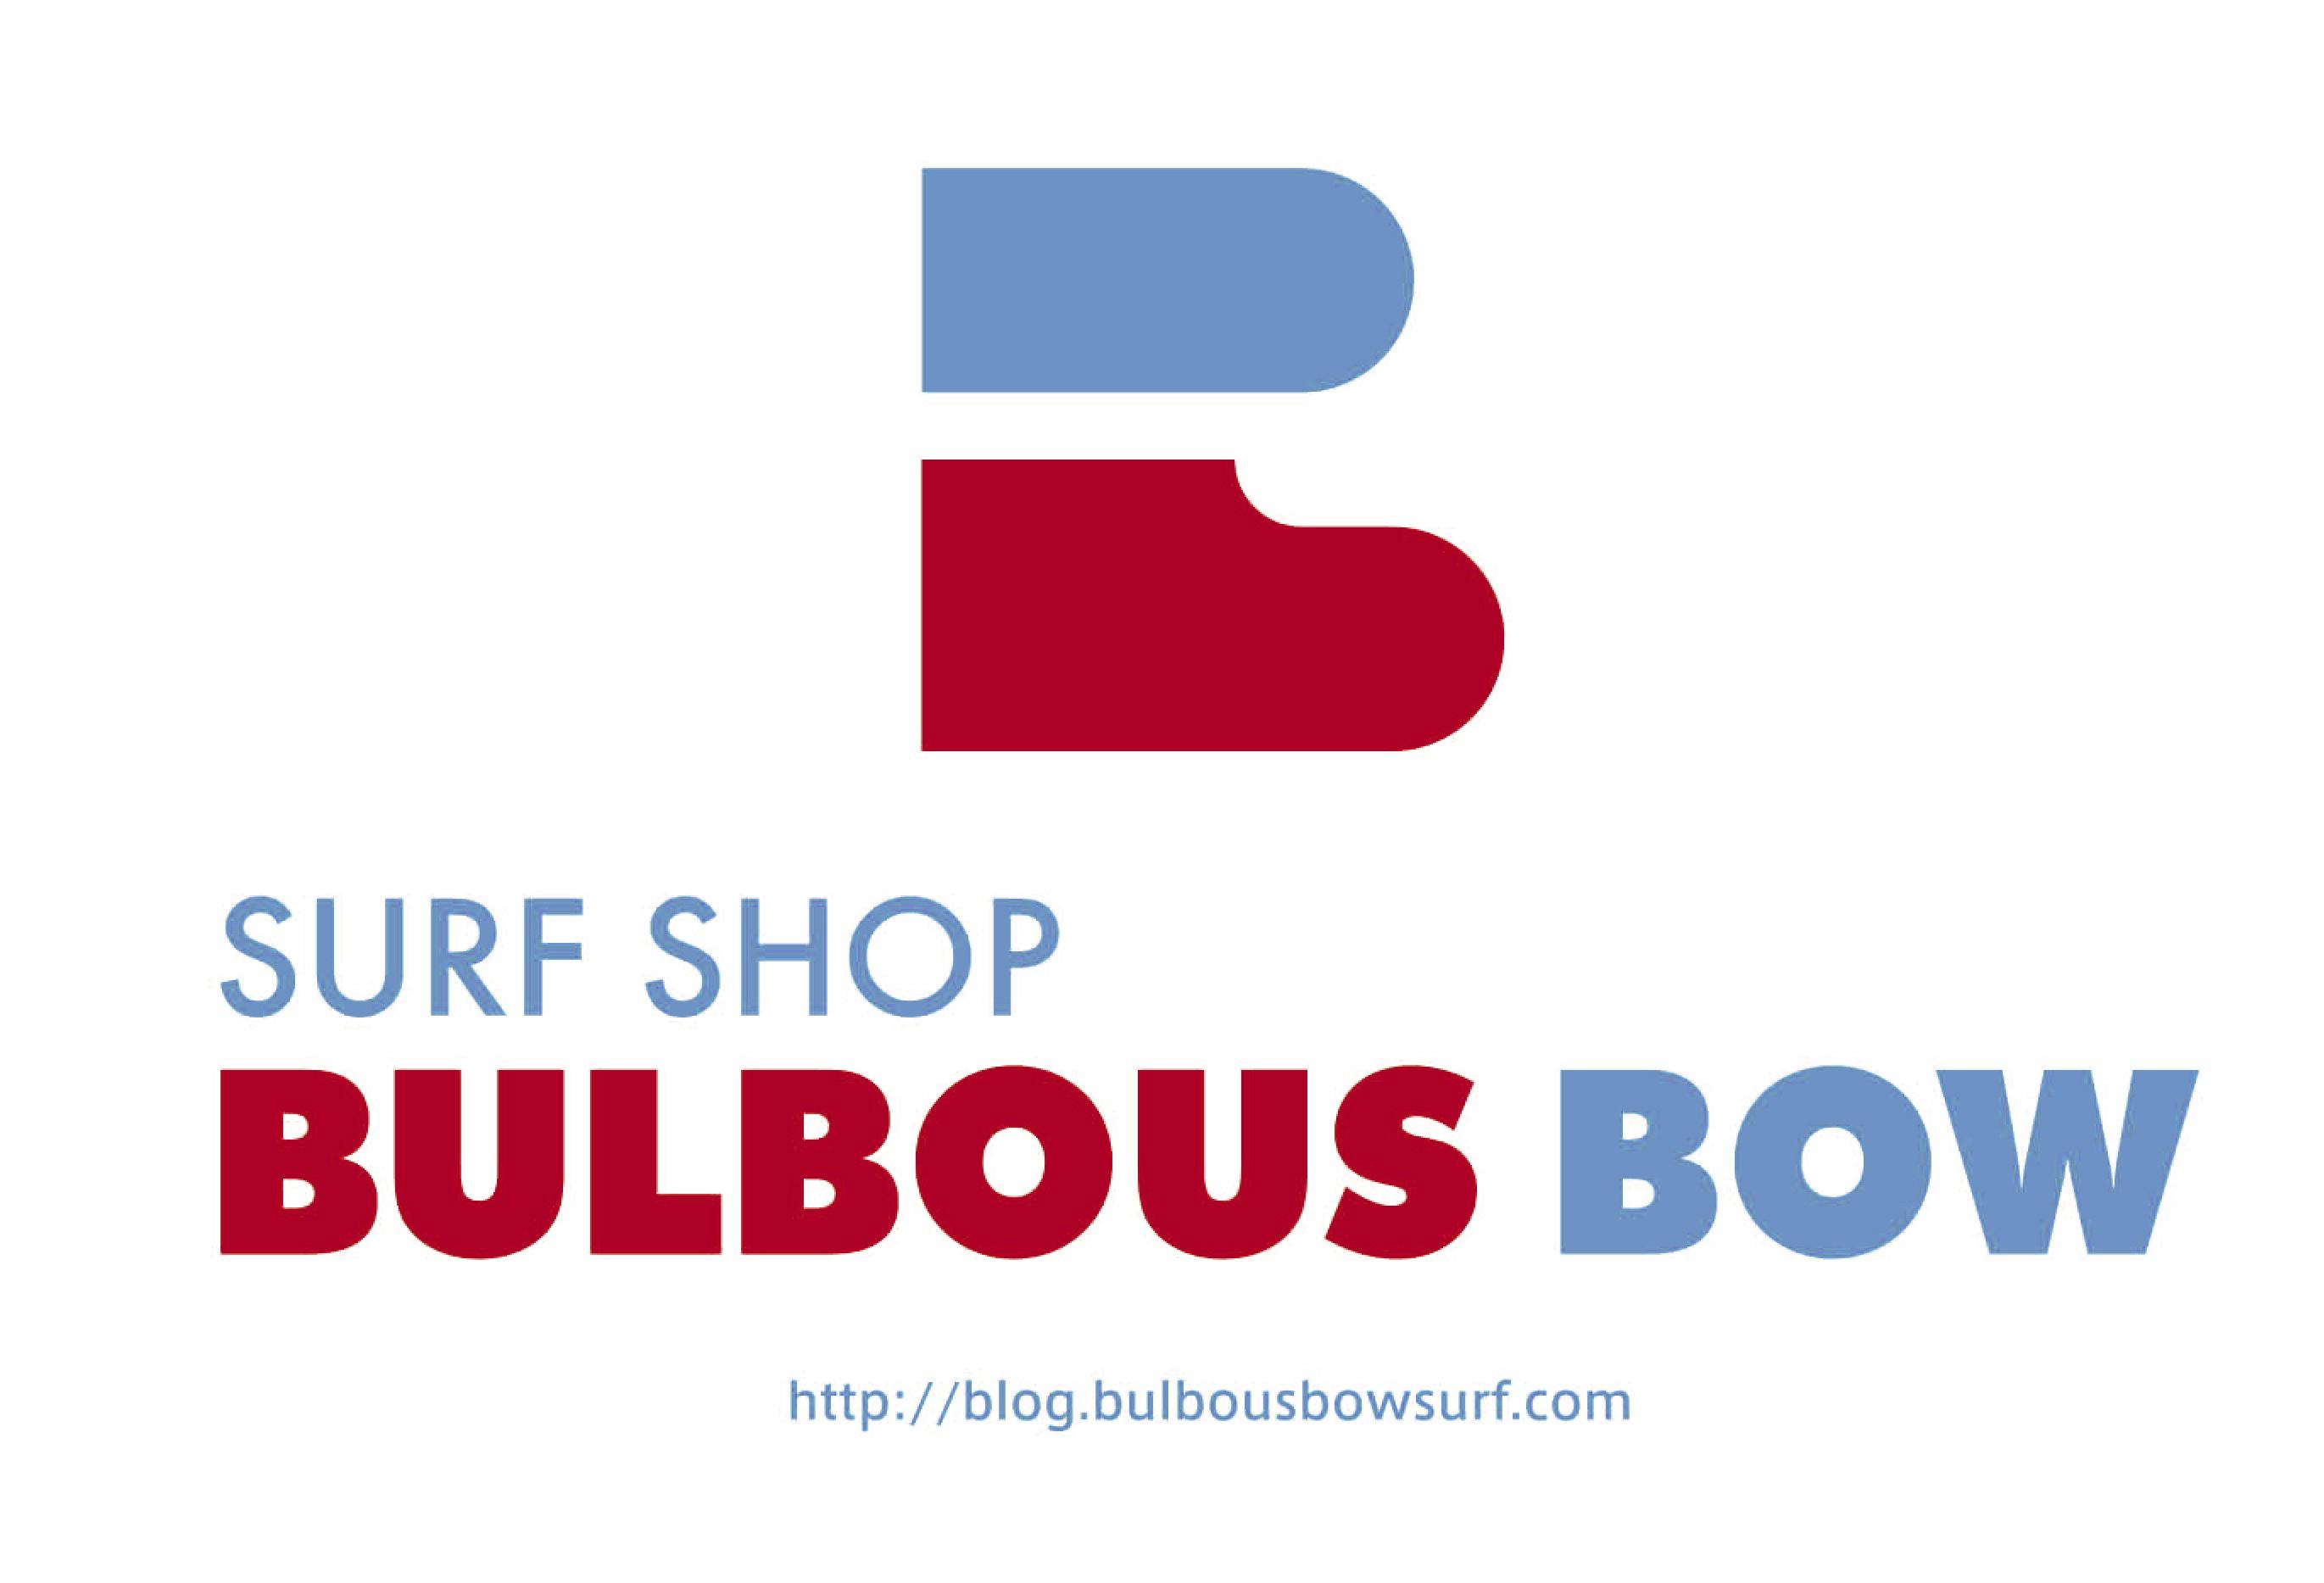 bulbousbowsurf